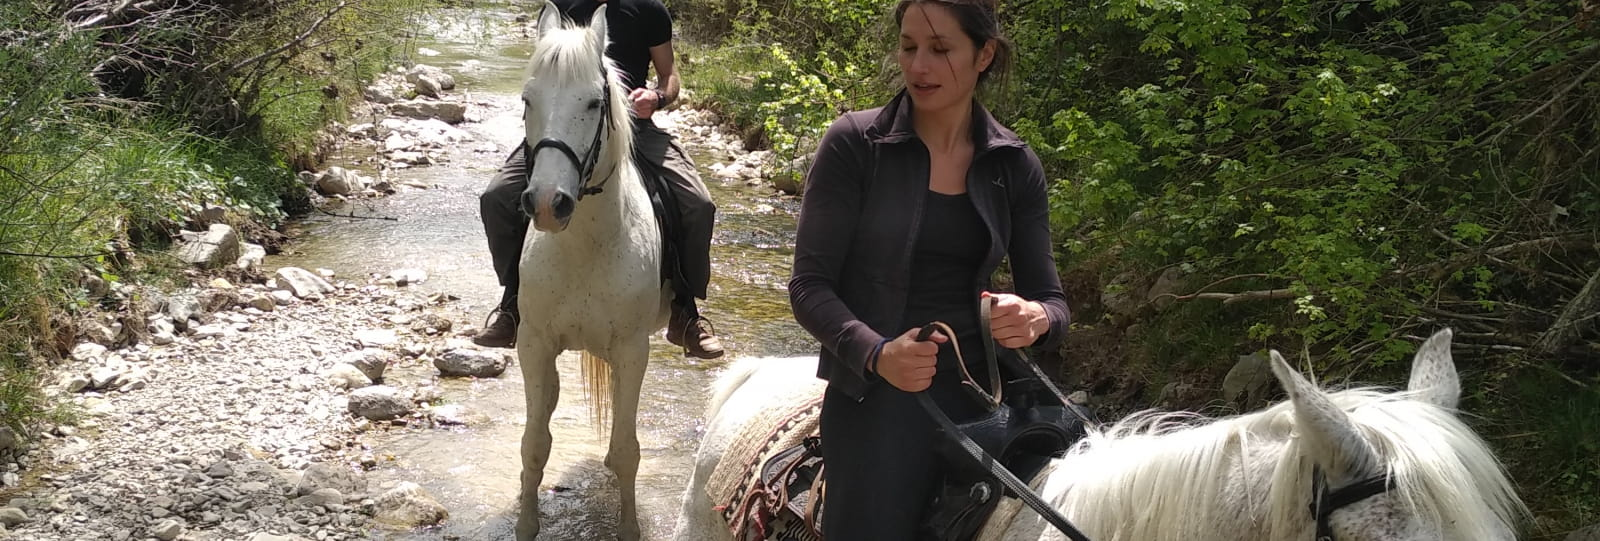 Balade à cheval (Baladez curieux)